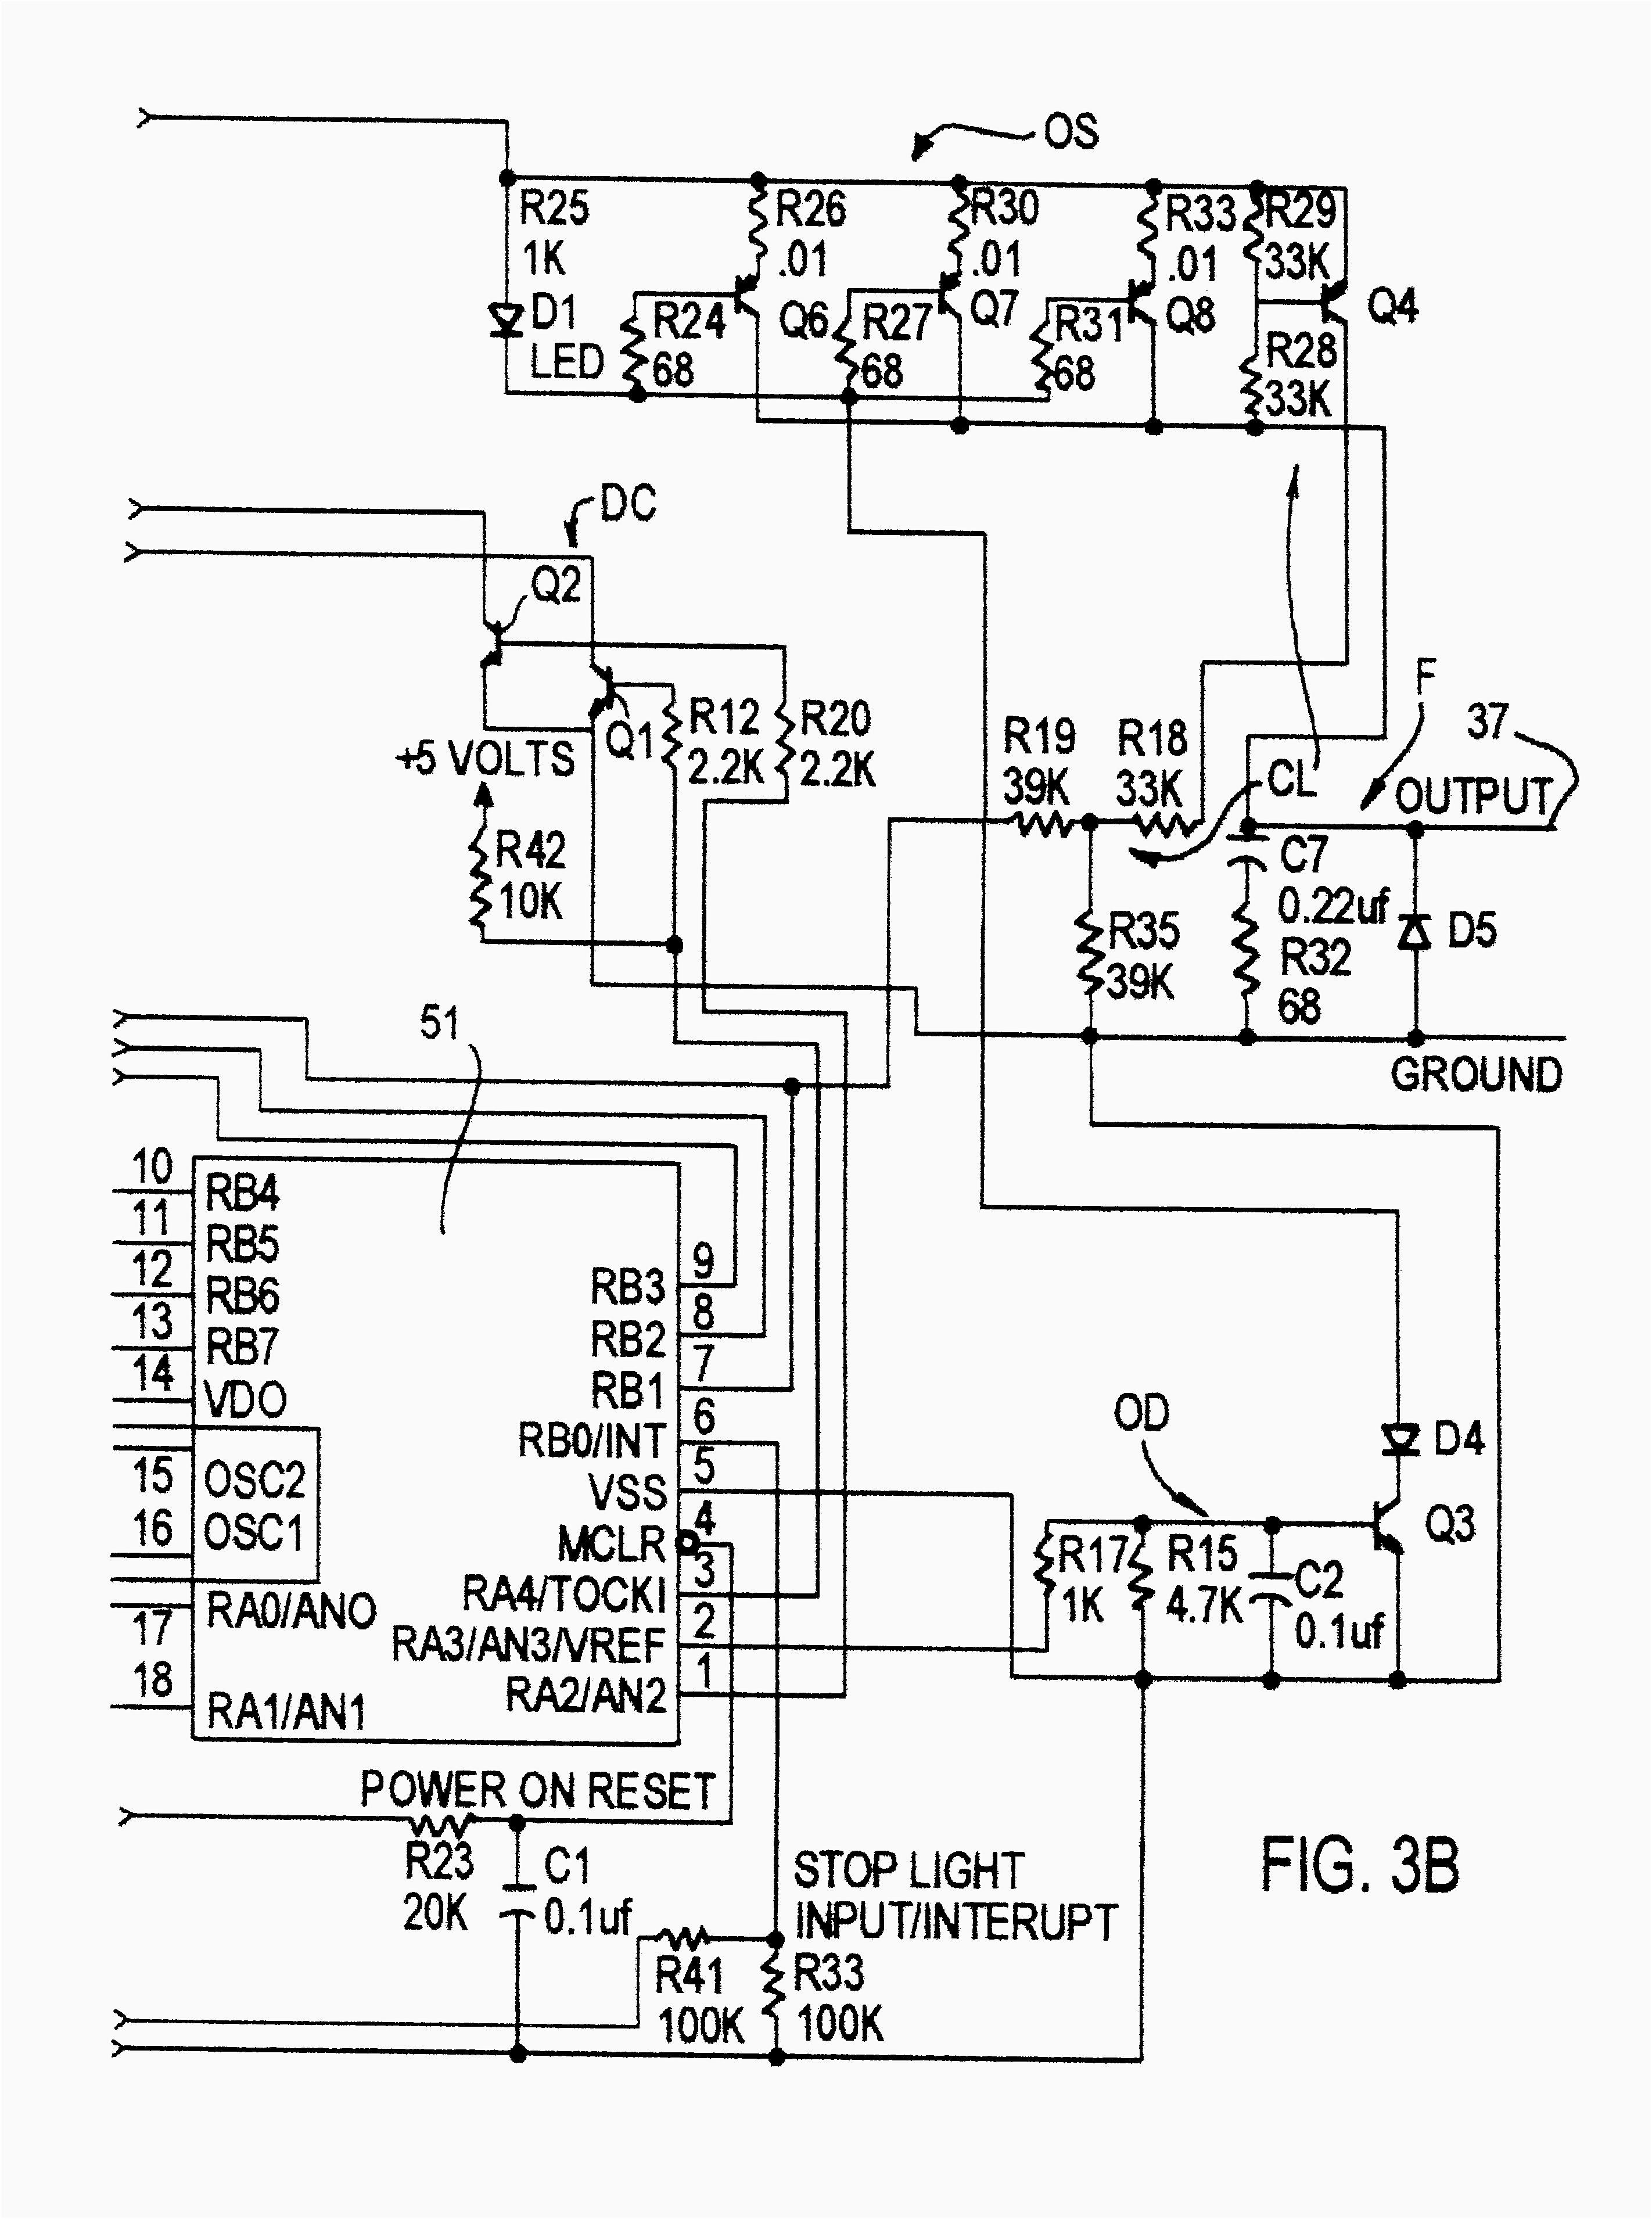 Wiring Diagram For Tekonsha Envoy Ke Controller | Wiring Library - Hayes Brake Controller Wiring Diagram